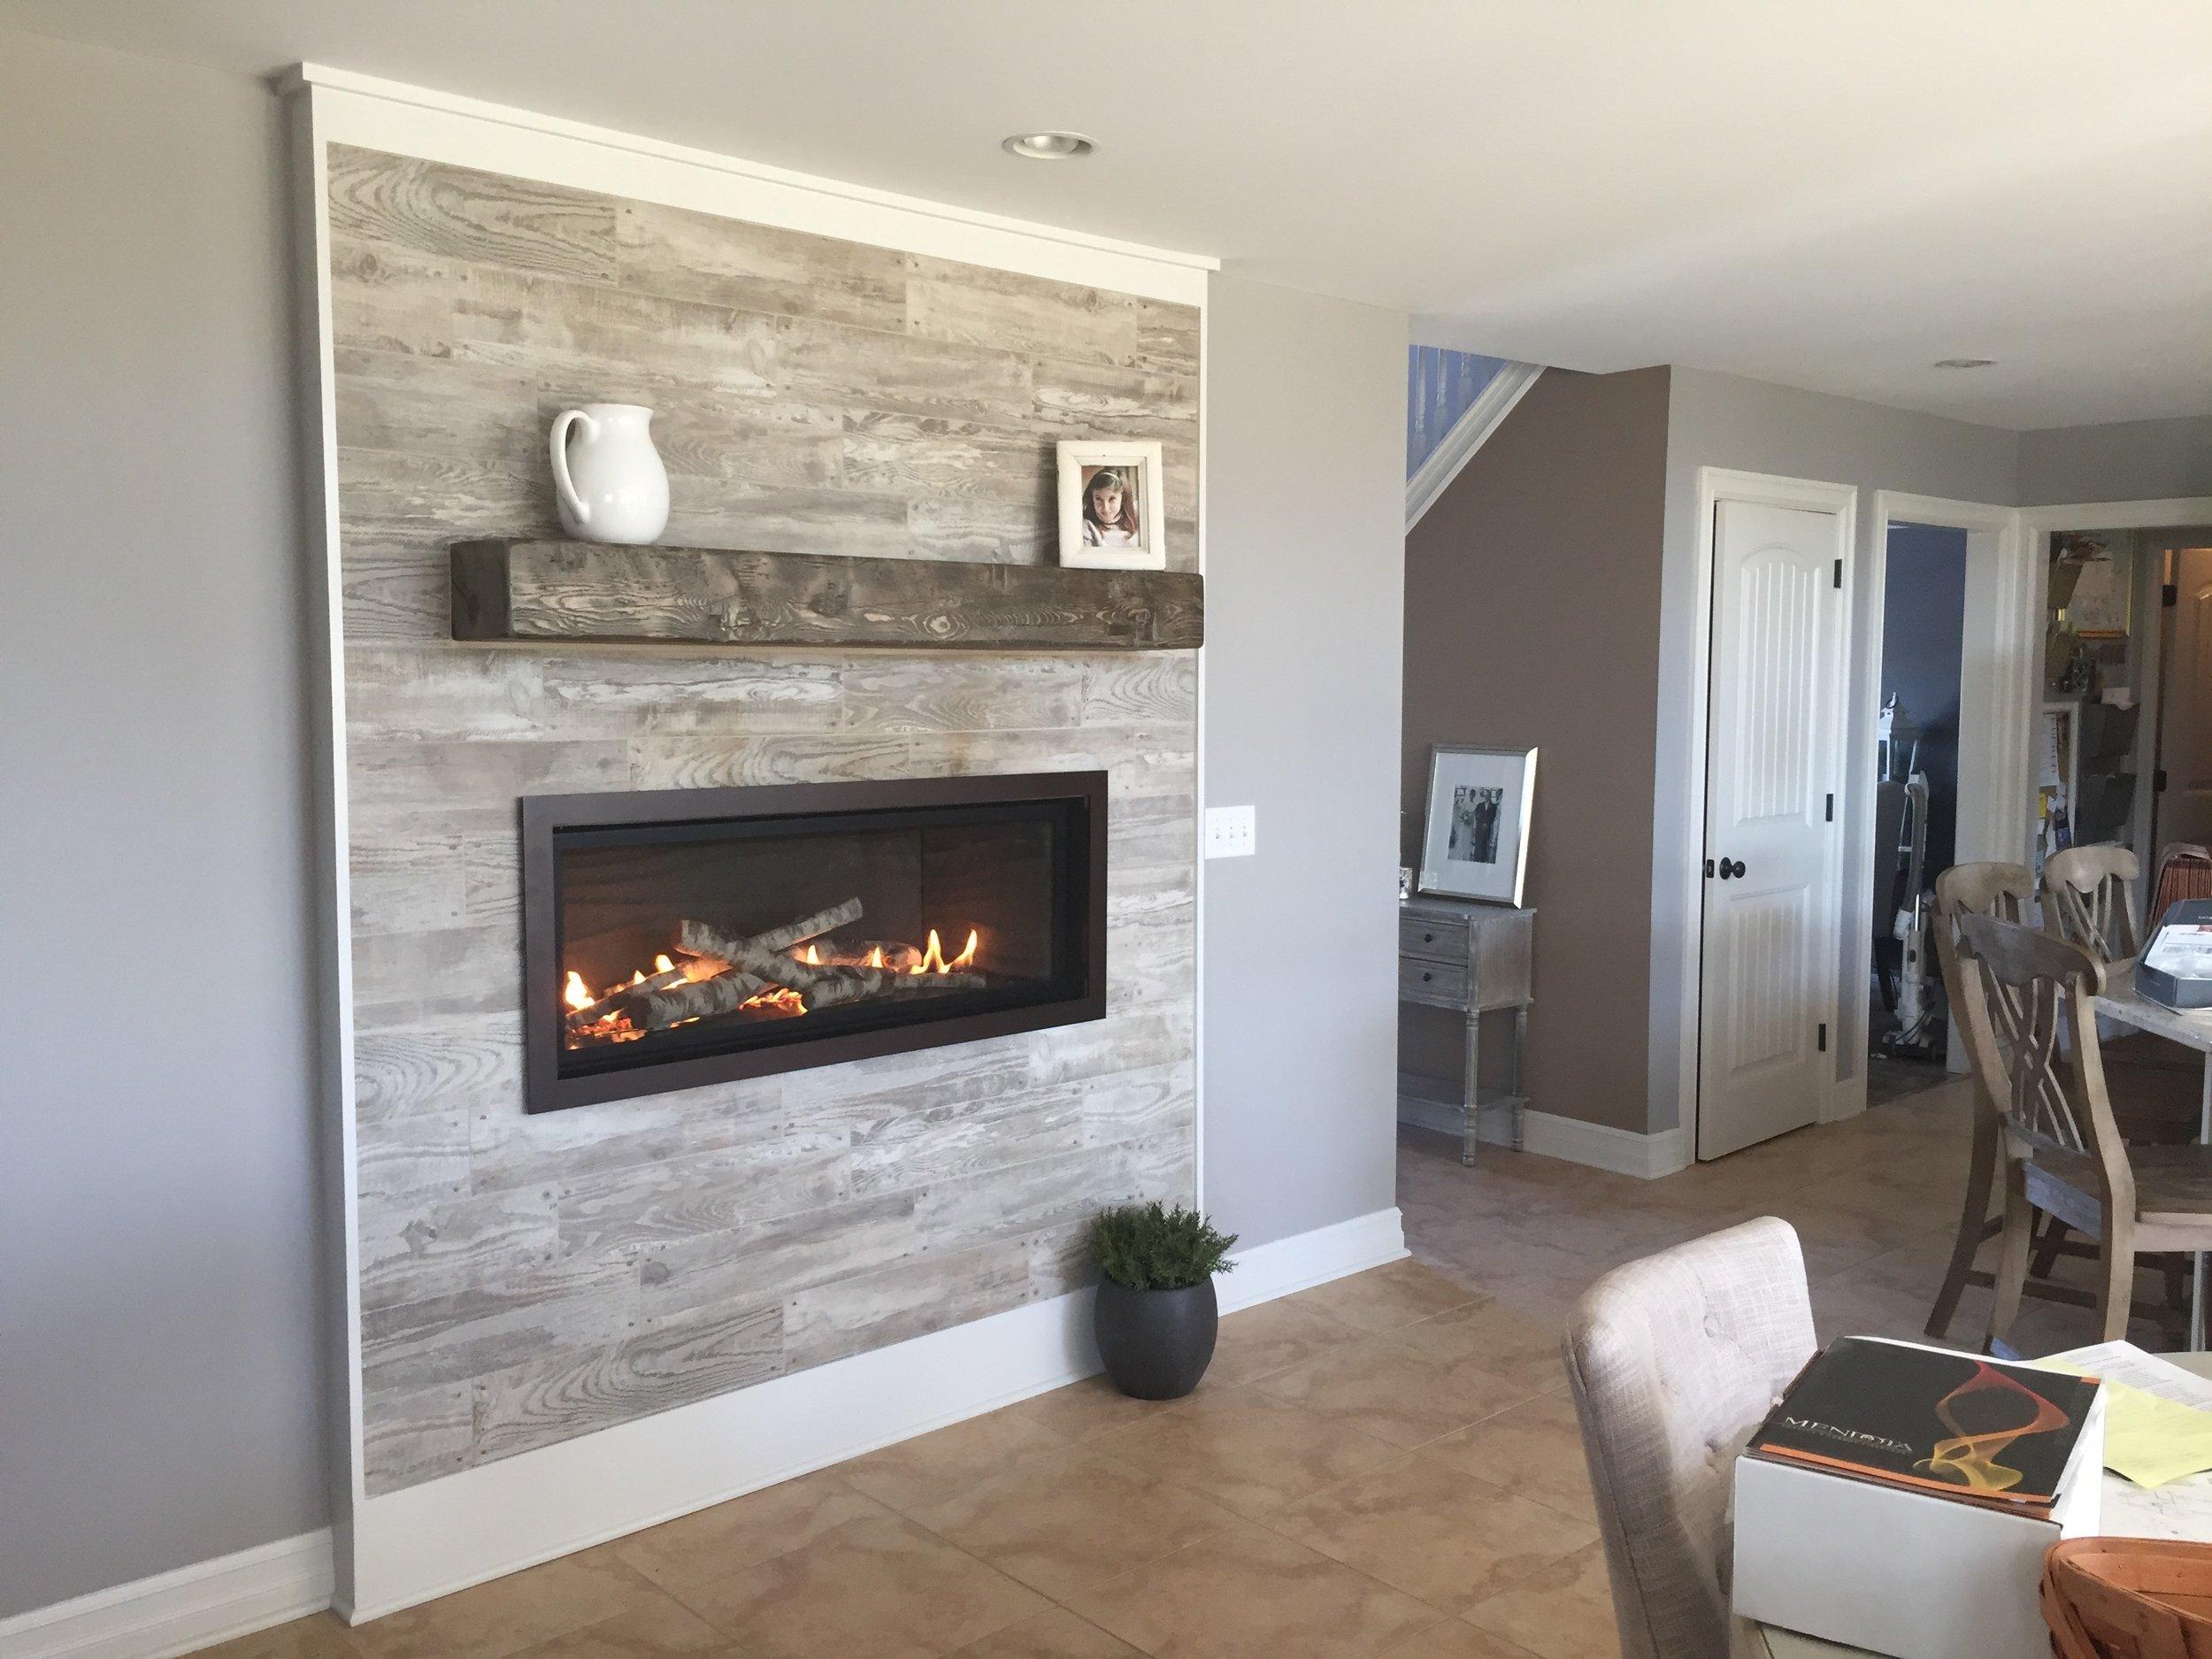 Toms Kitchen Fireplace ML47.jpg